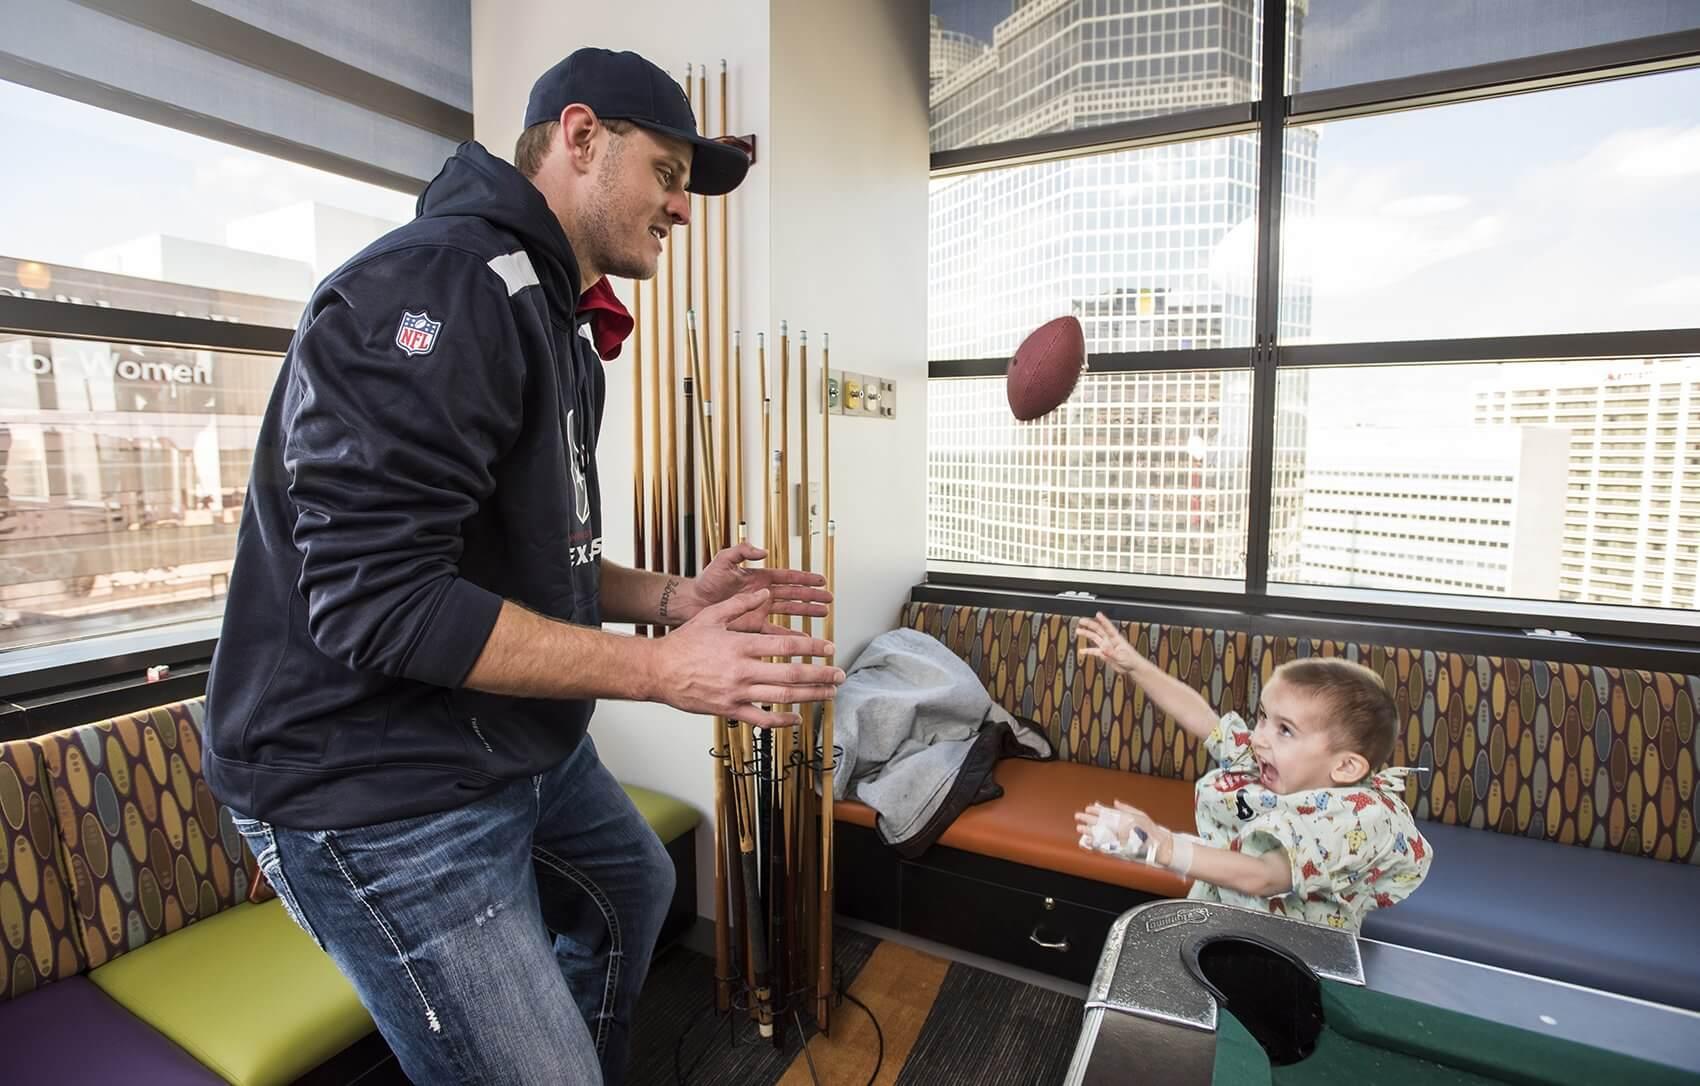 Texans quarterback Ryan Mallett plays catch with Jeremiah Green. (Credit: Allen S. Kramer/Texas Children's Hospital)